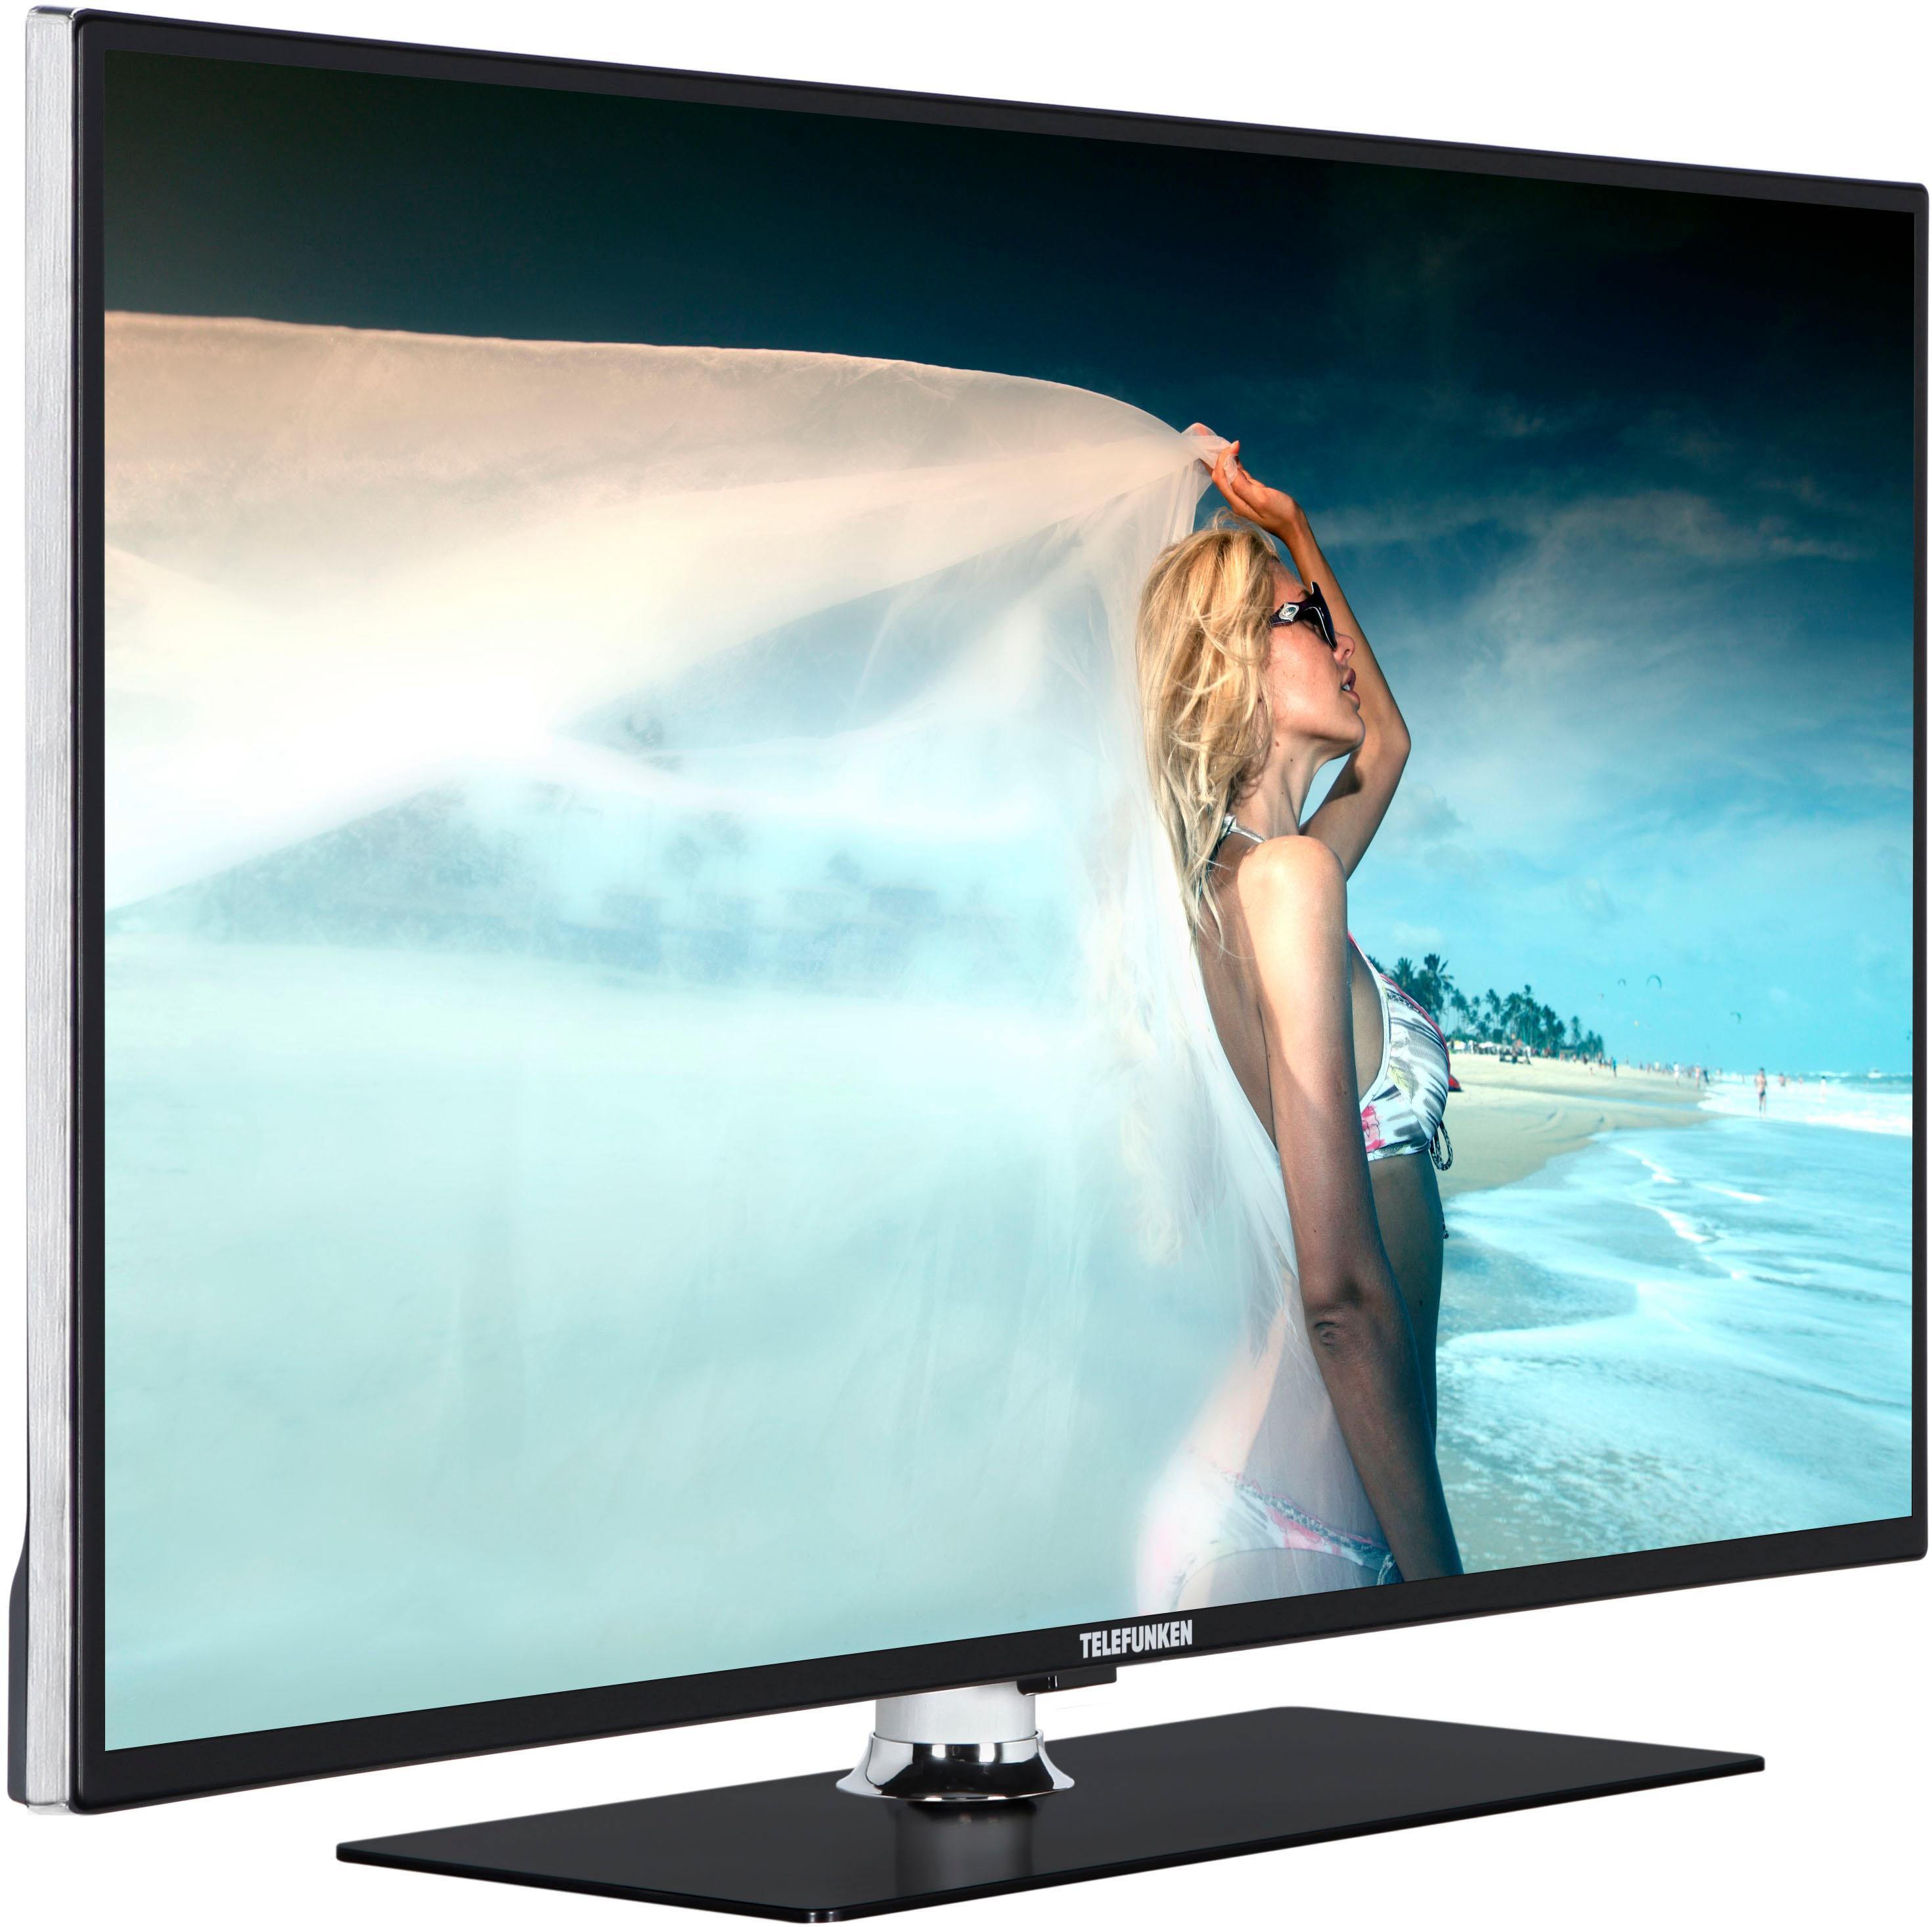 Telefunken L32f800m4cwi Led Fernseher 81 Cm 32 Zoll Full Hd